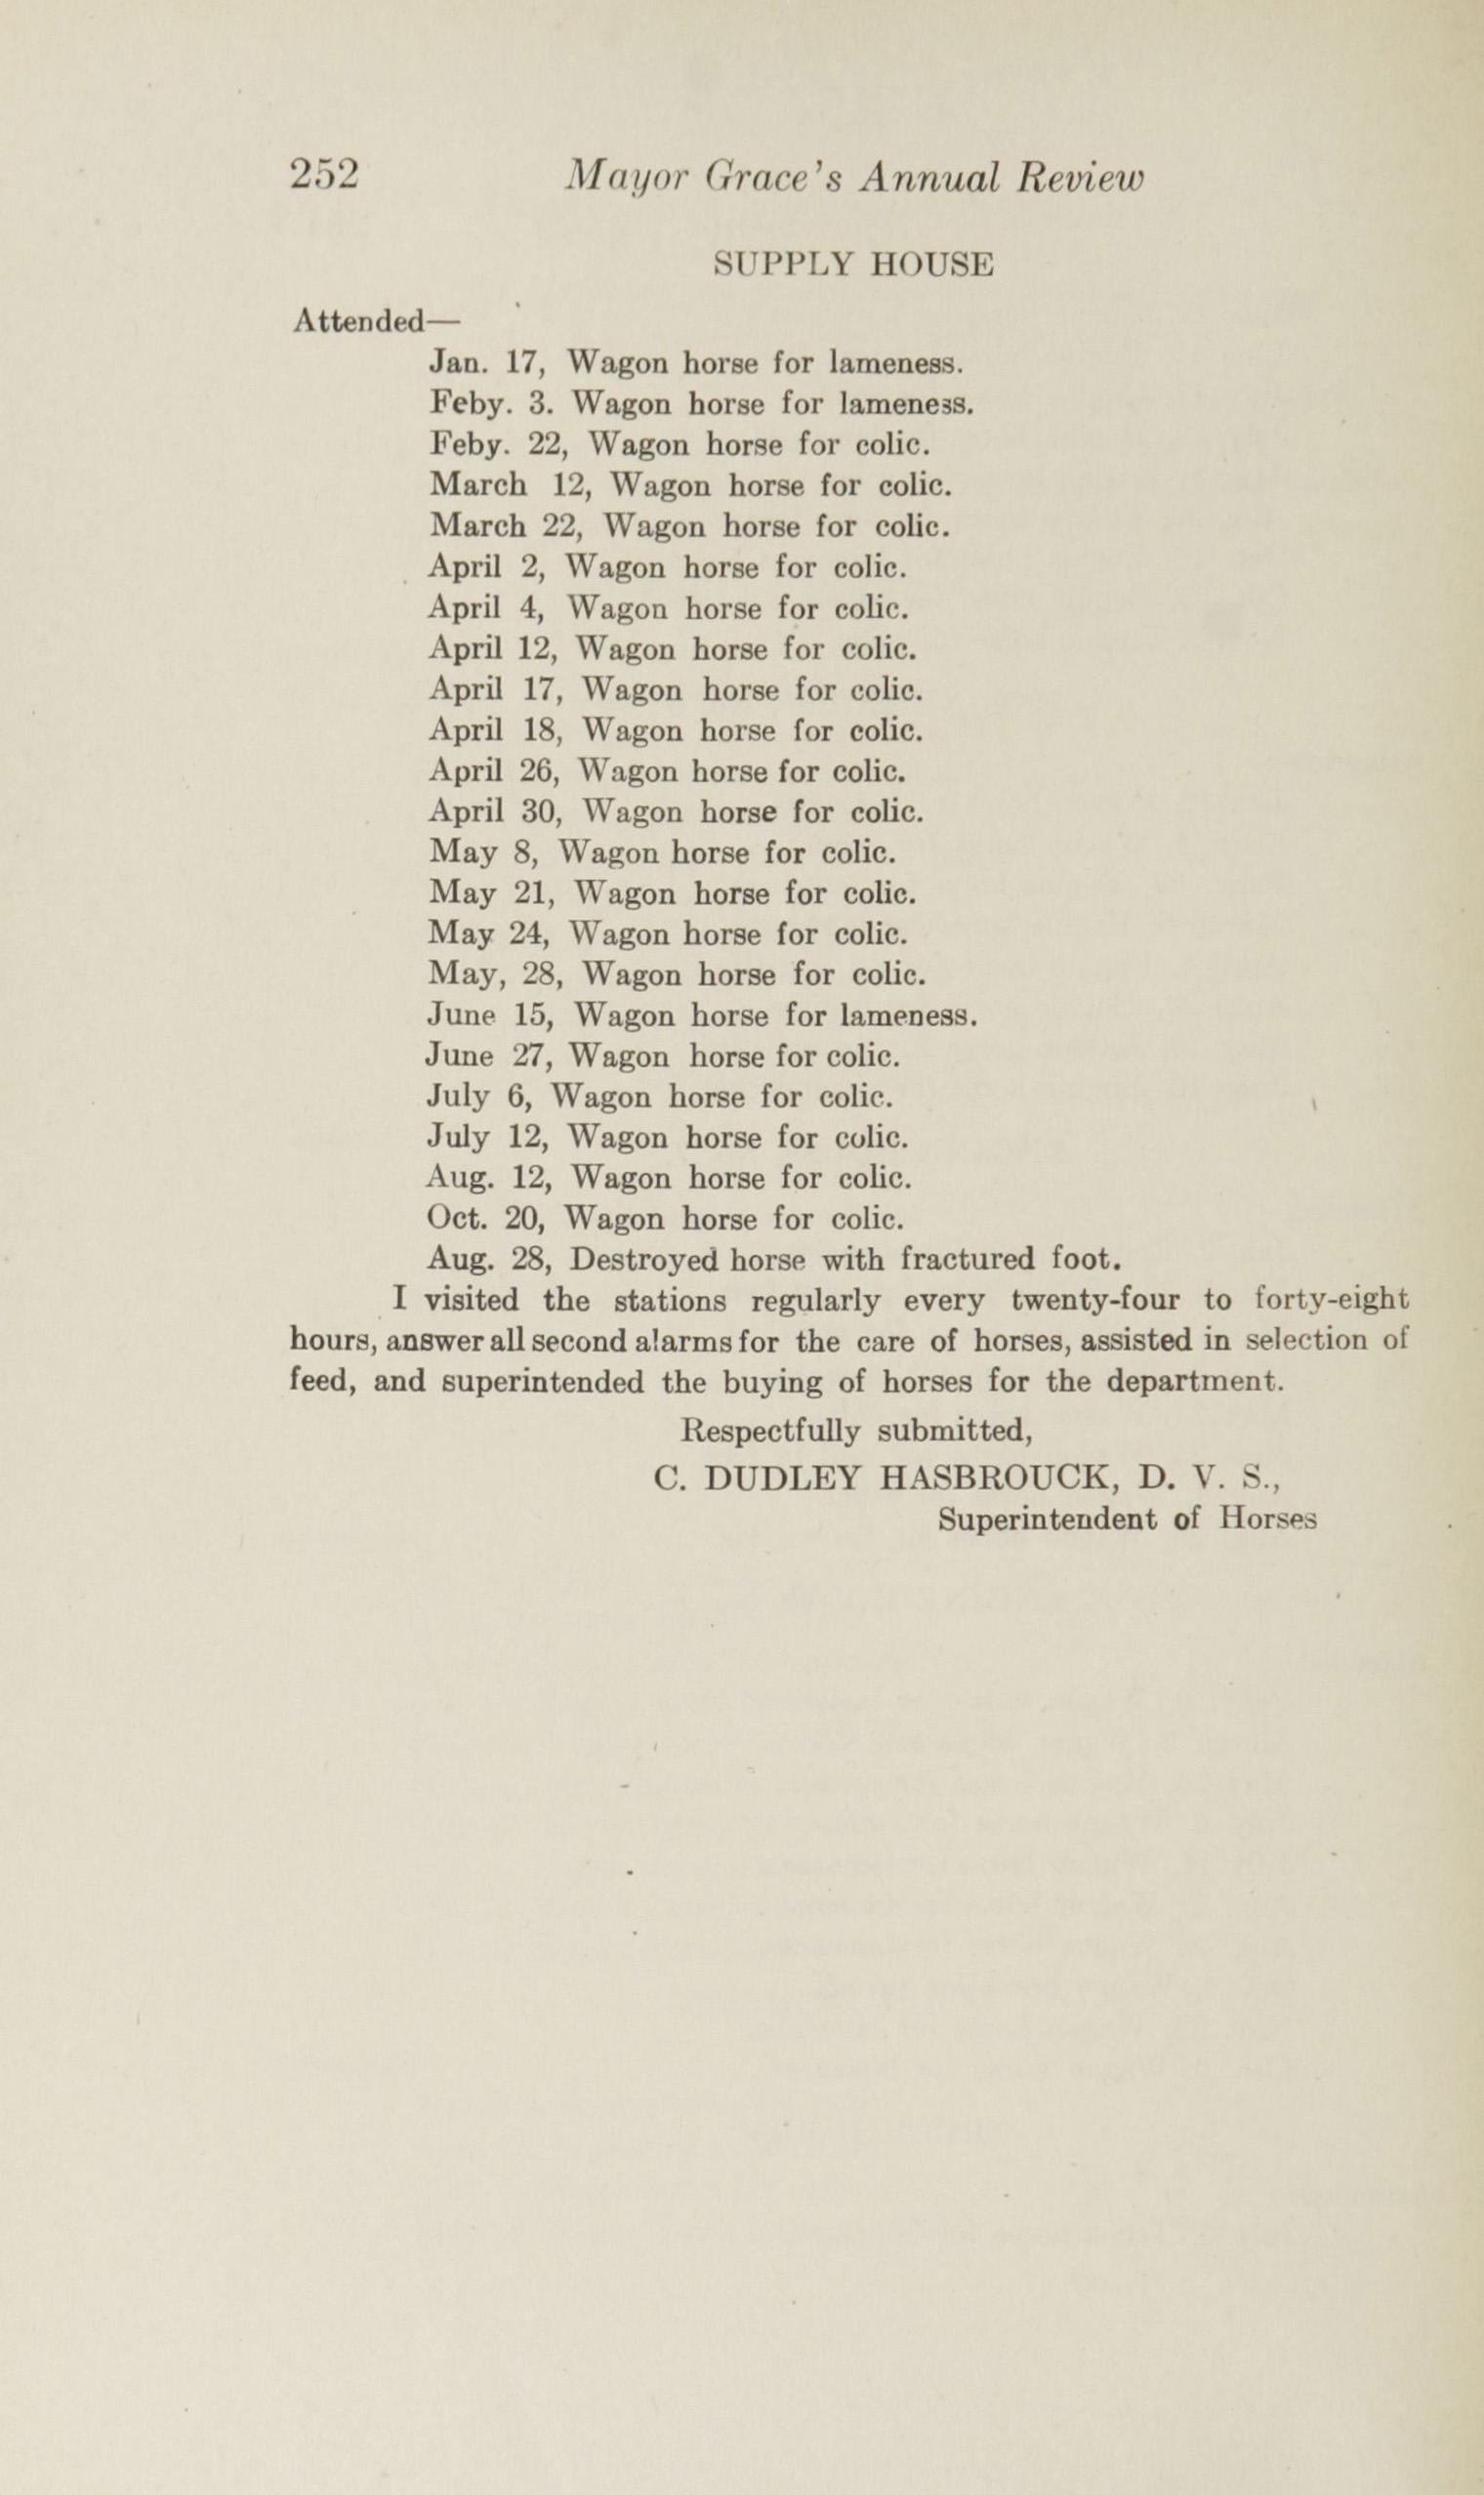 Charleston Yearbook, 1915, page 252